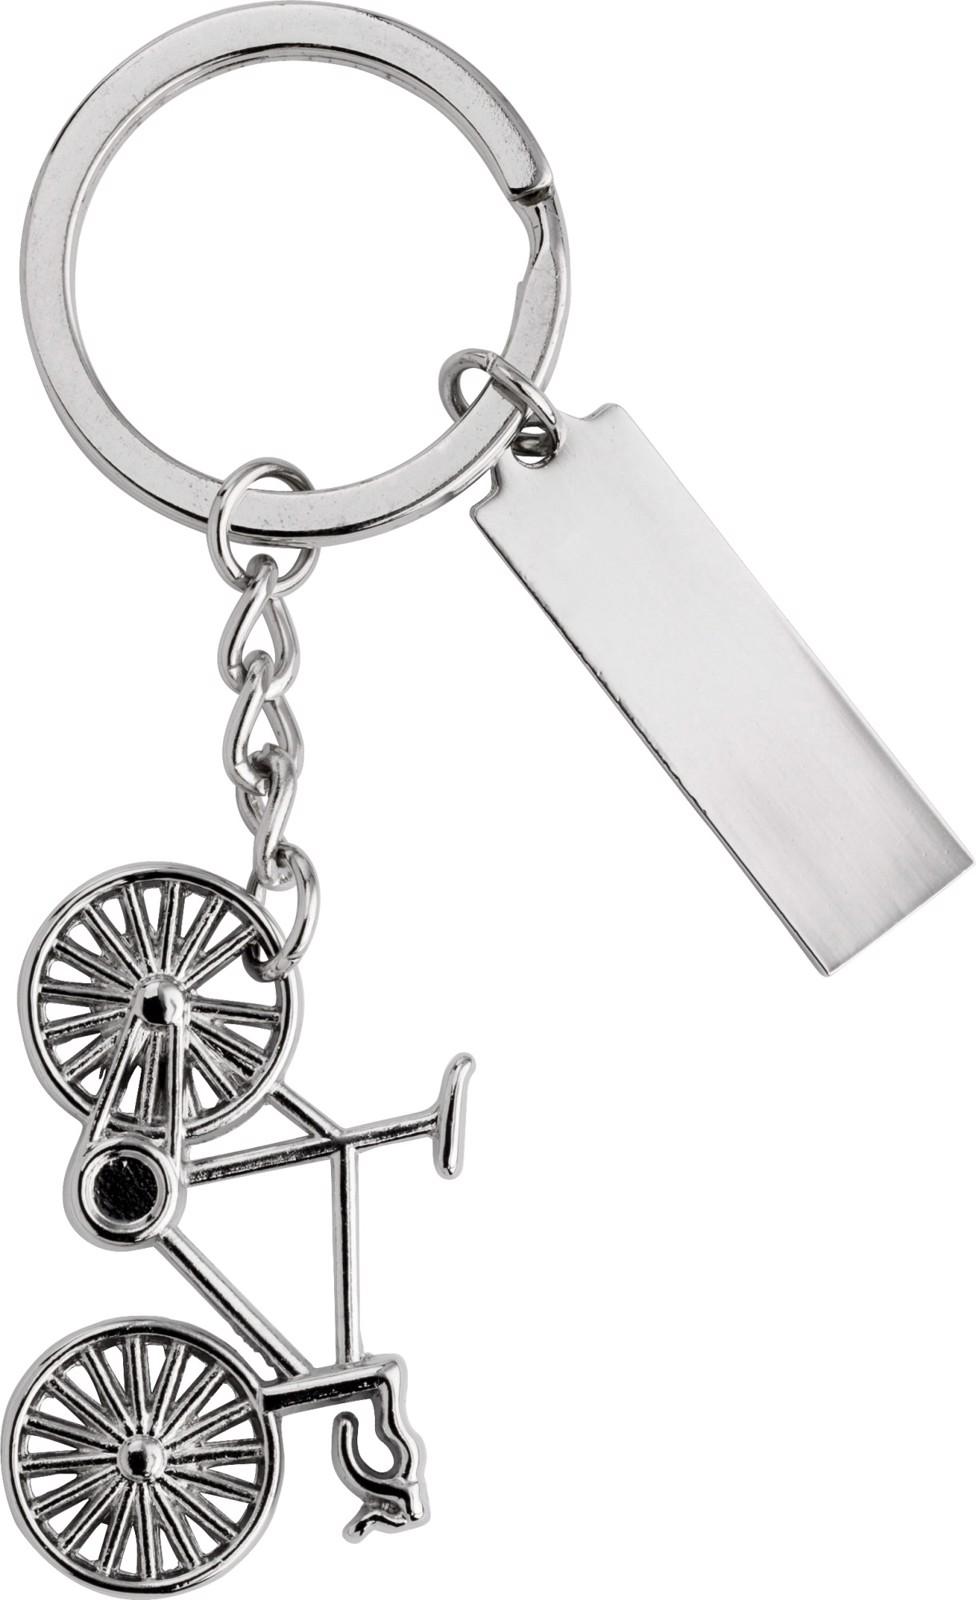 Nickel plated key holder